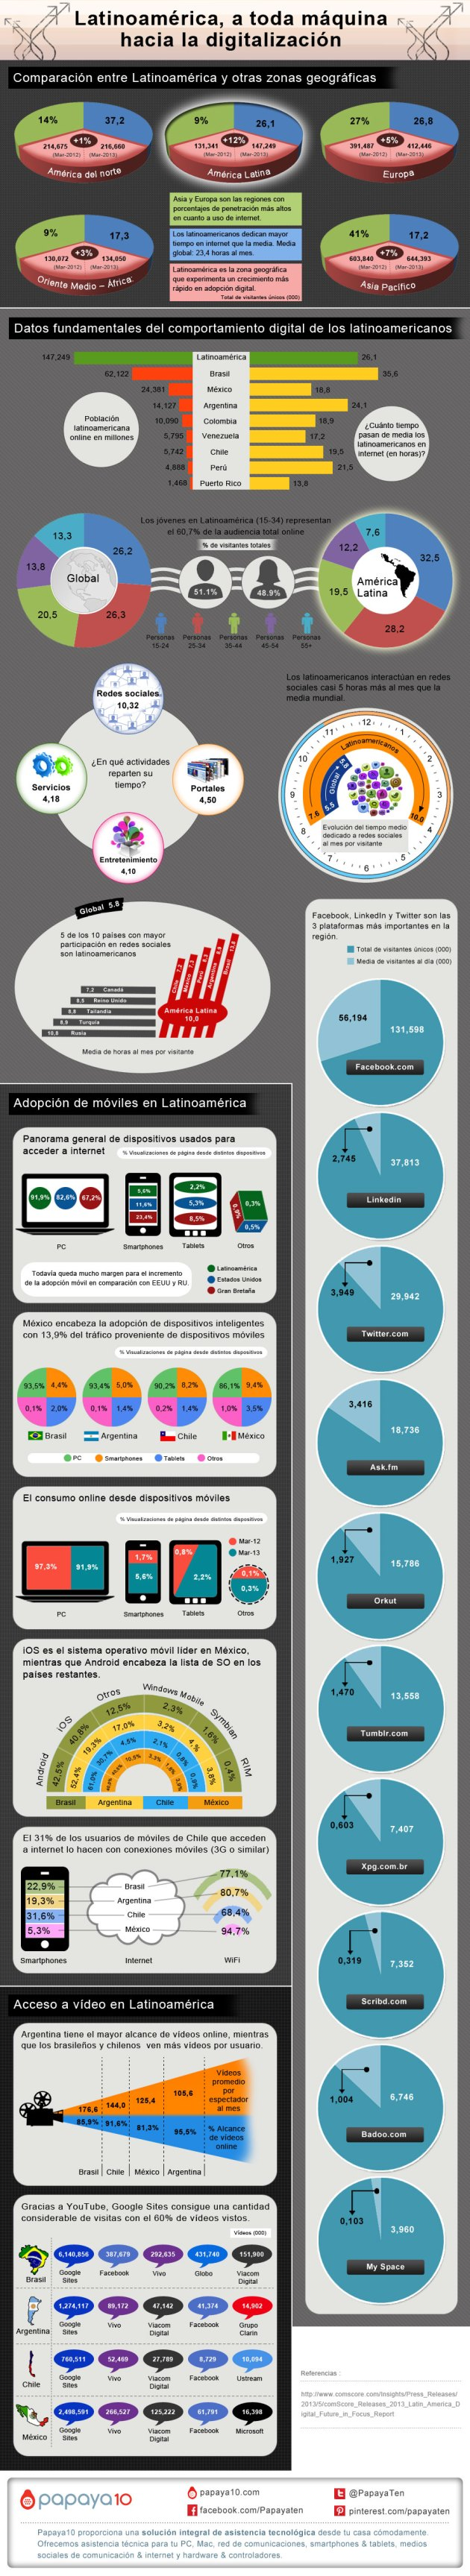 Latinoamerica-hacia-la-digitalizacion